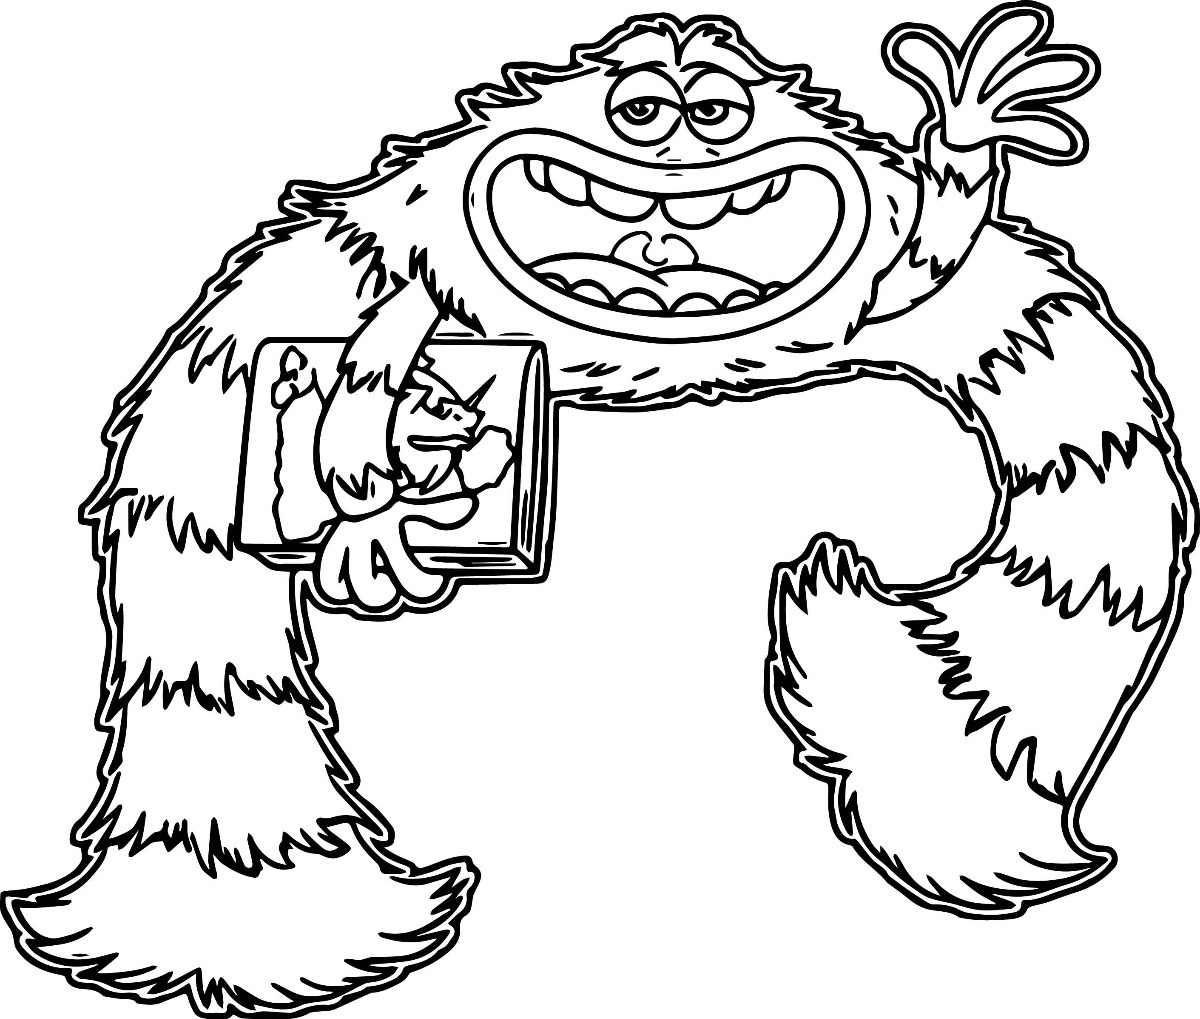 Dibujos Para Colorear De Monster Inc Imagesacolorierwebsite